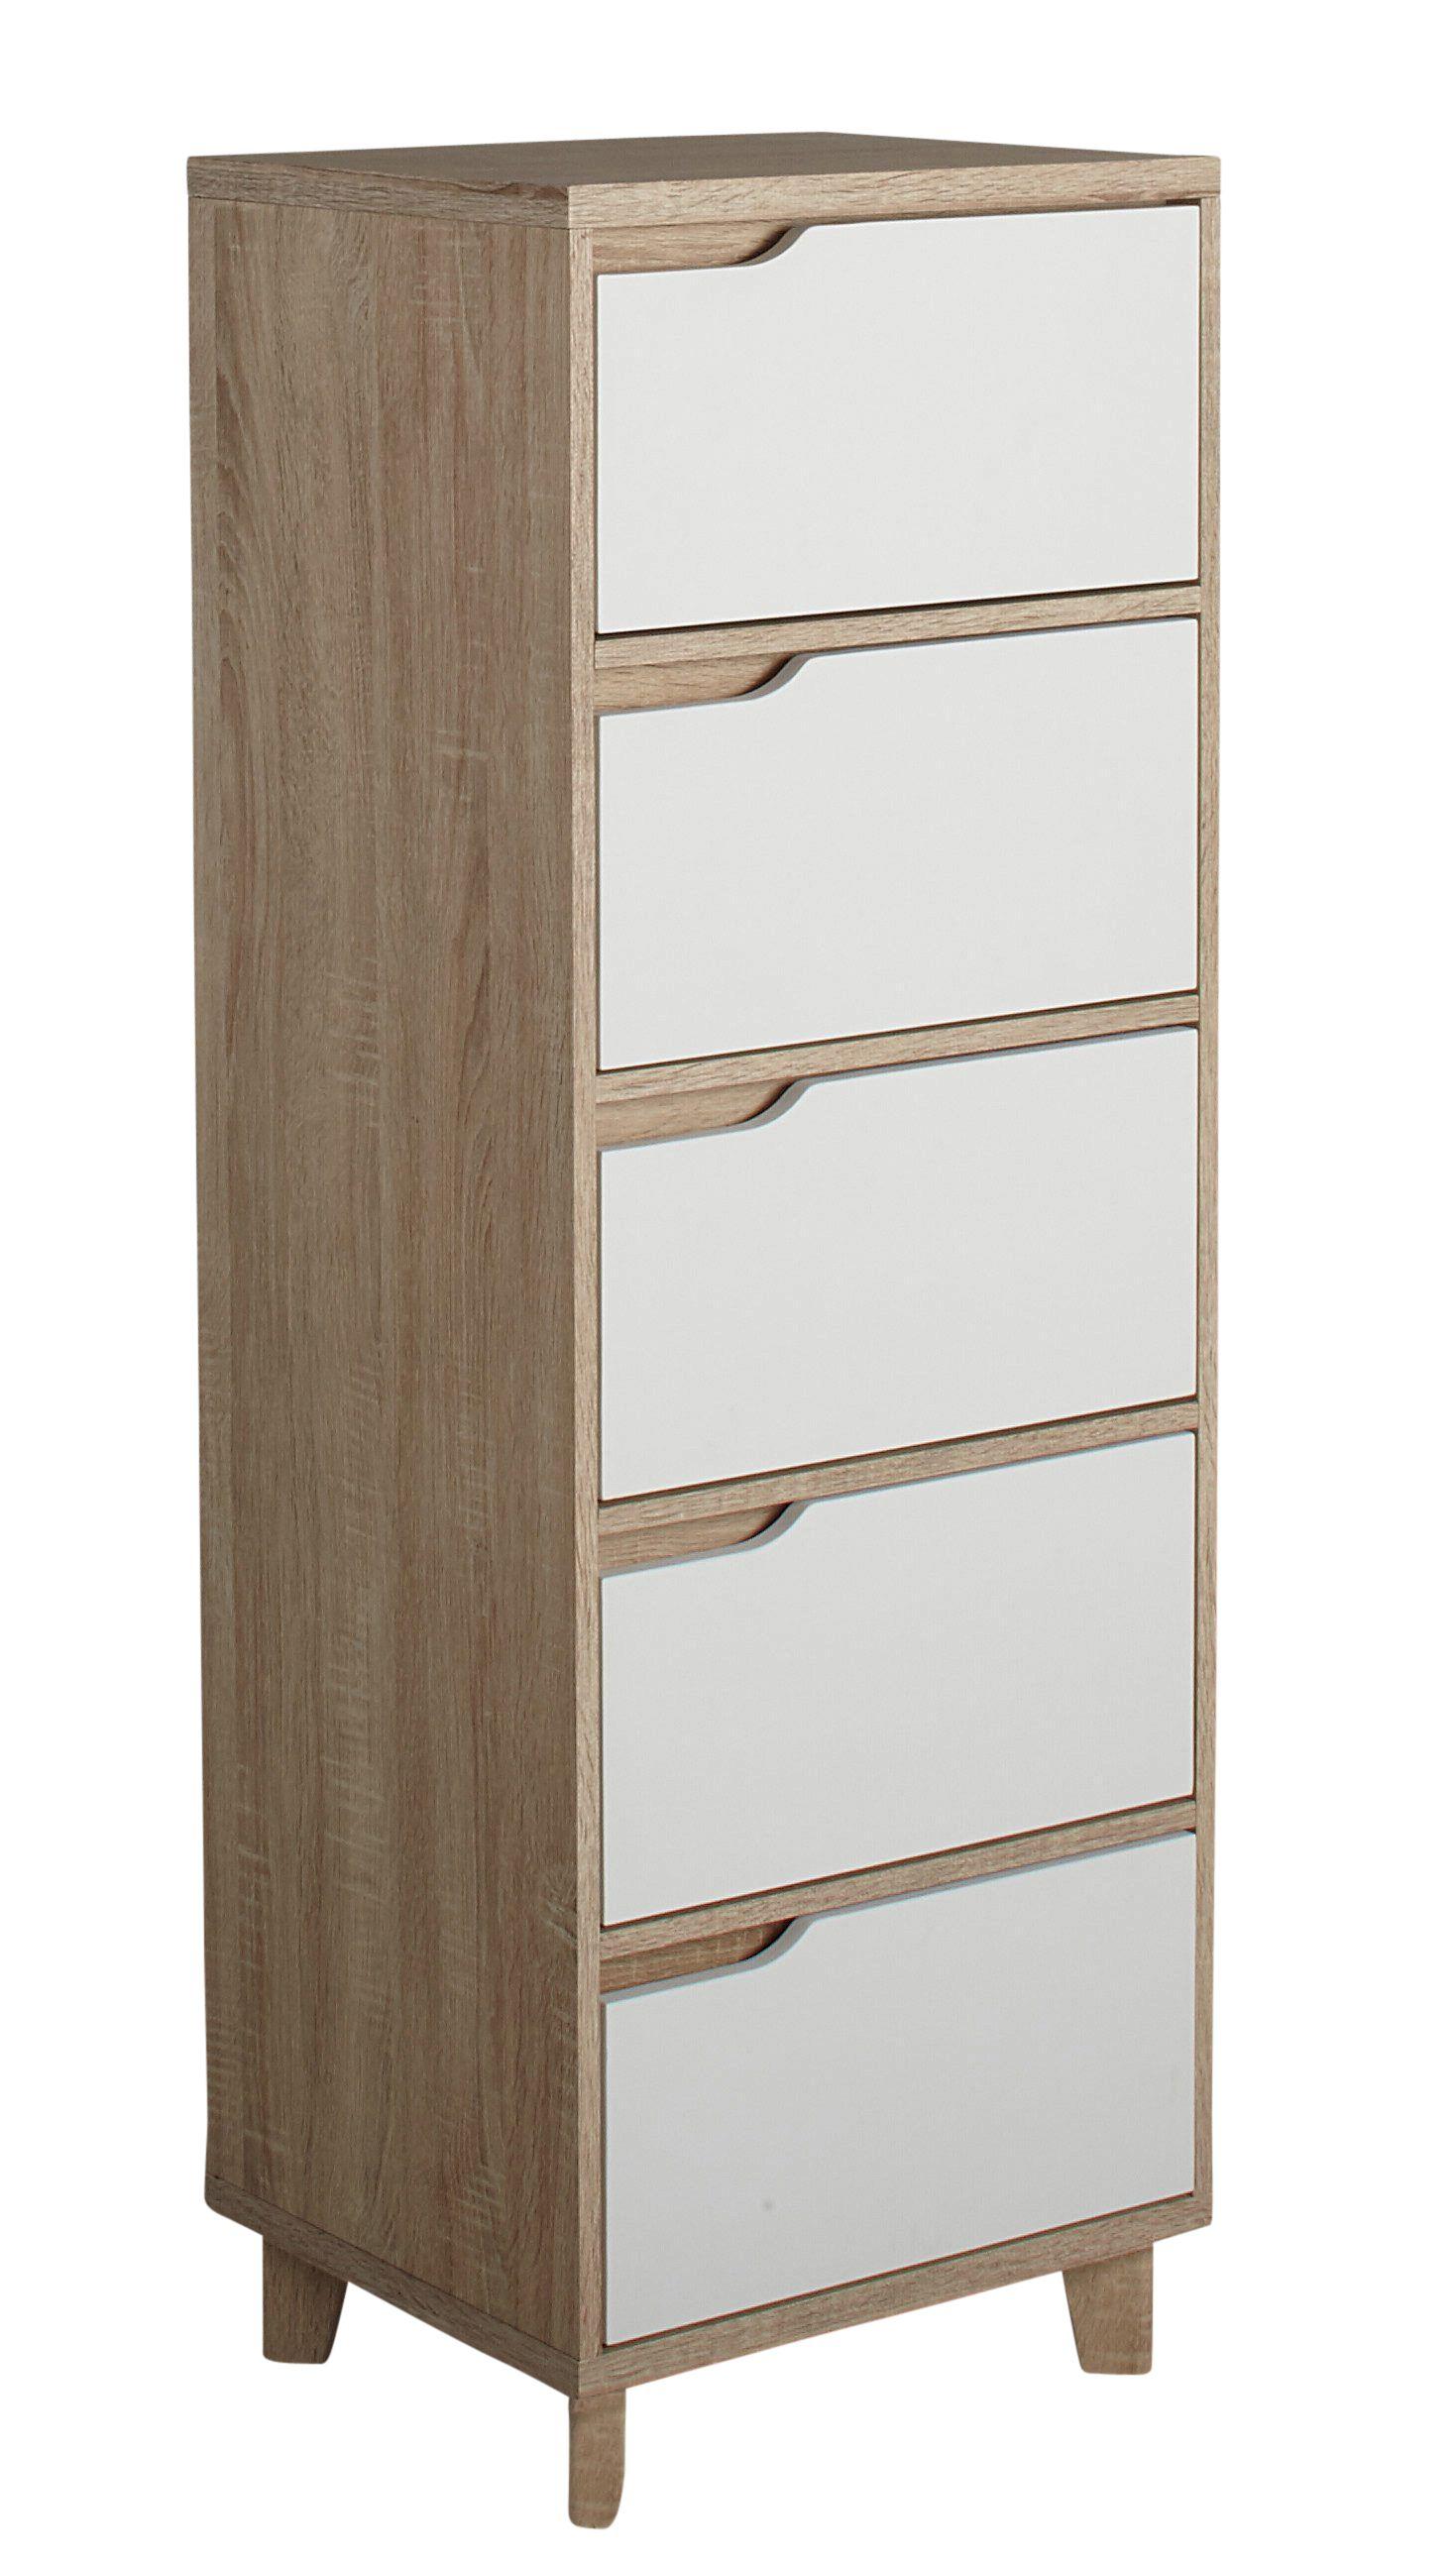 Chiffonnier 5 tiroirs Nordic imitation chêne et blanc en 2019 | Nid ...